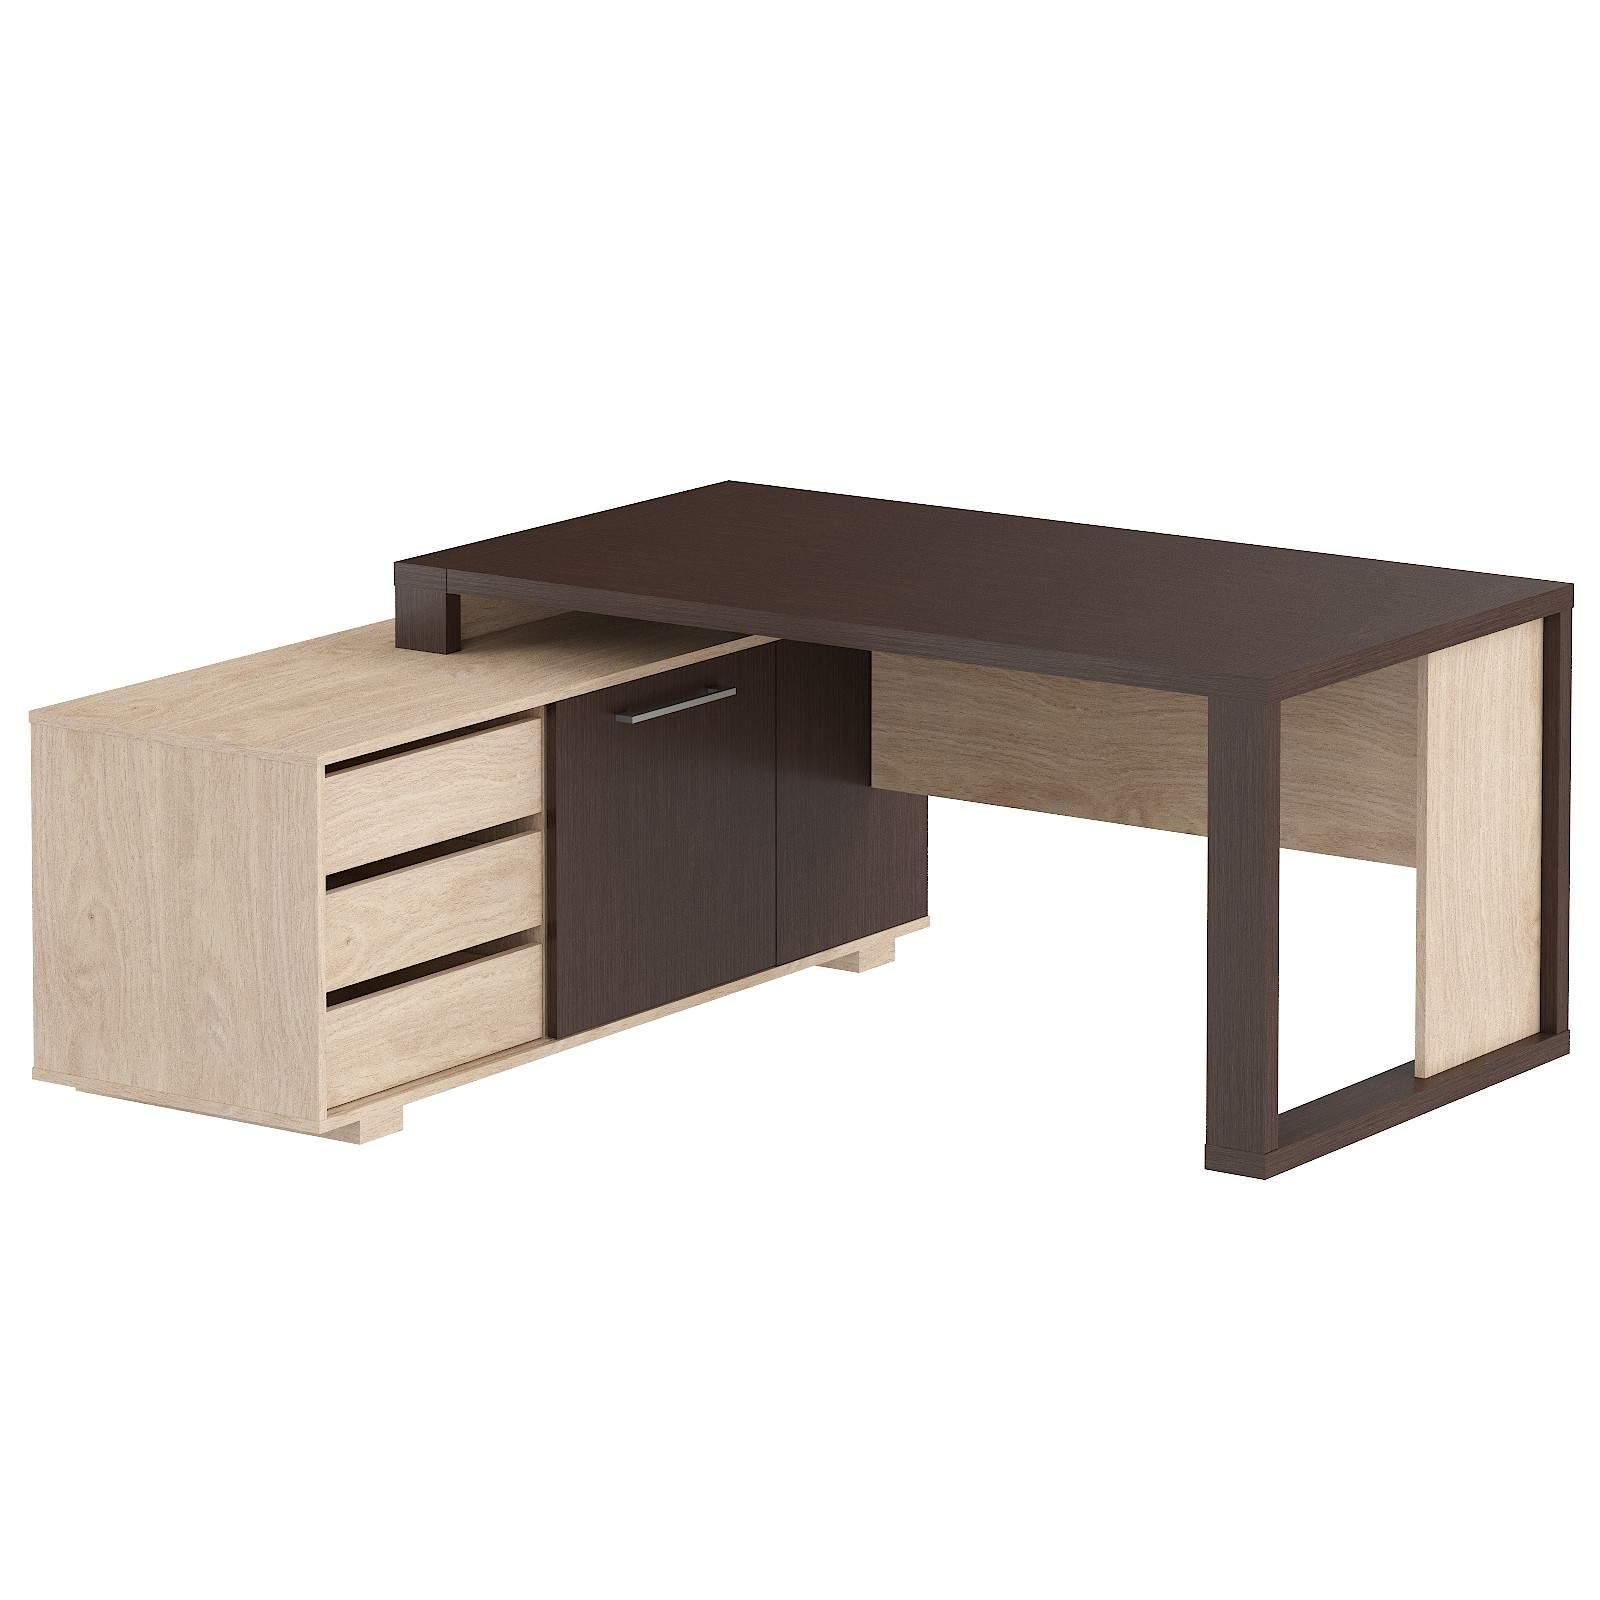 Стол на опорной тумбе с ящиками левый 1750x1600x750